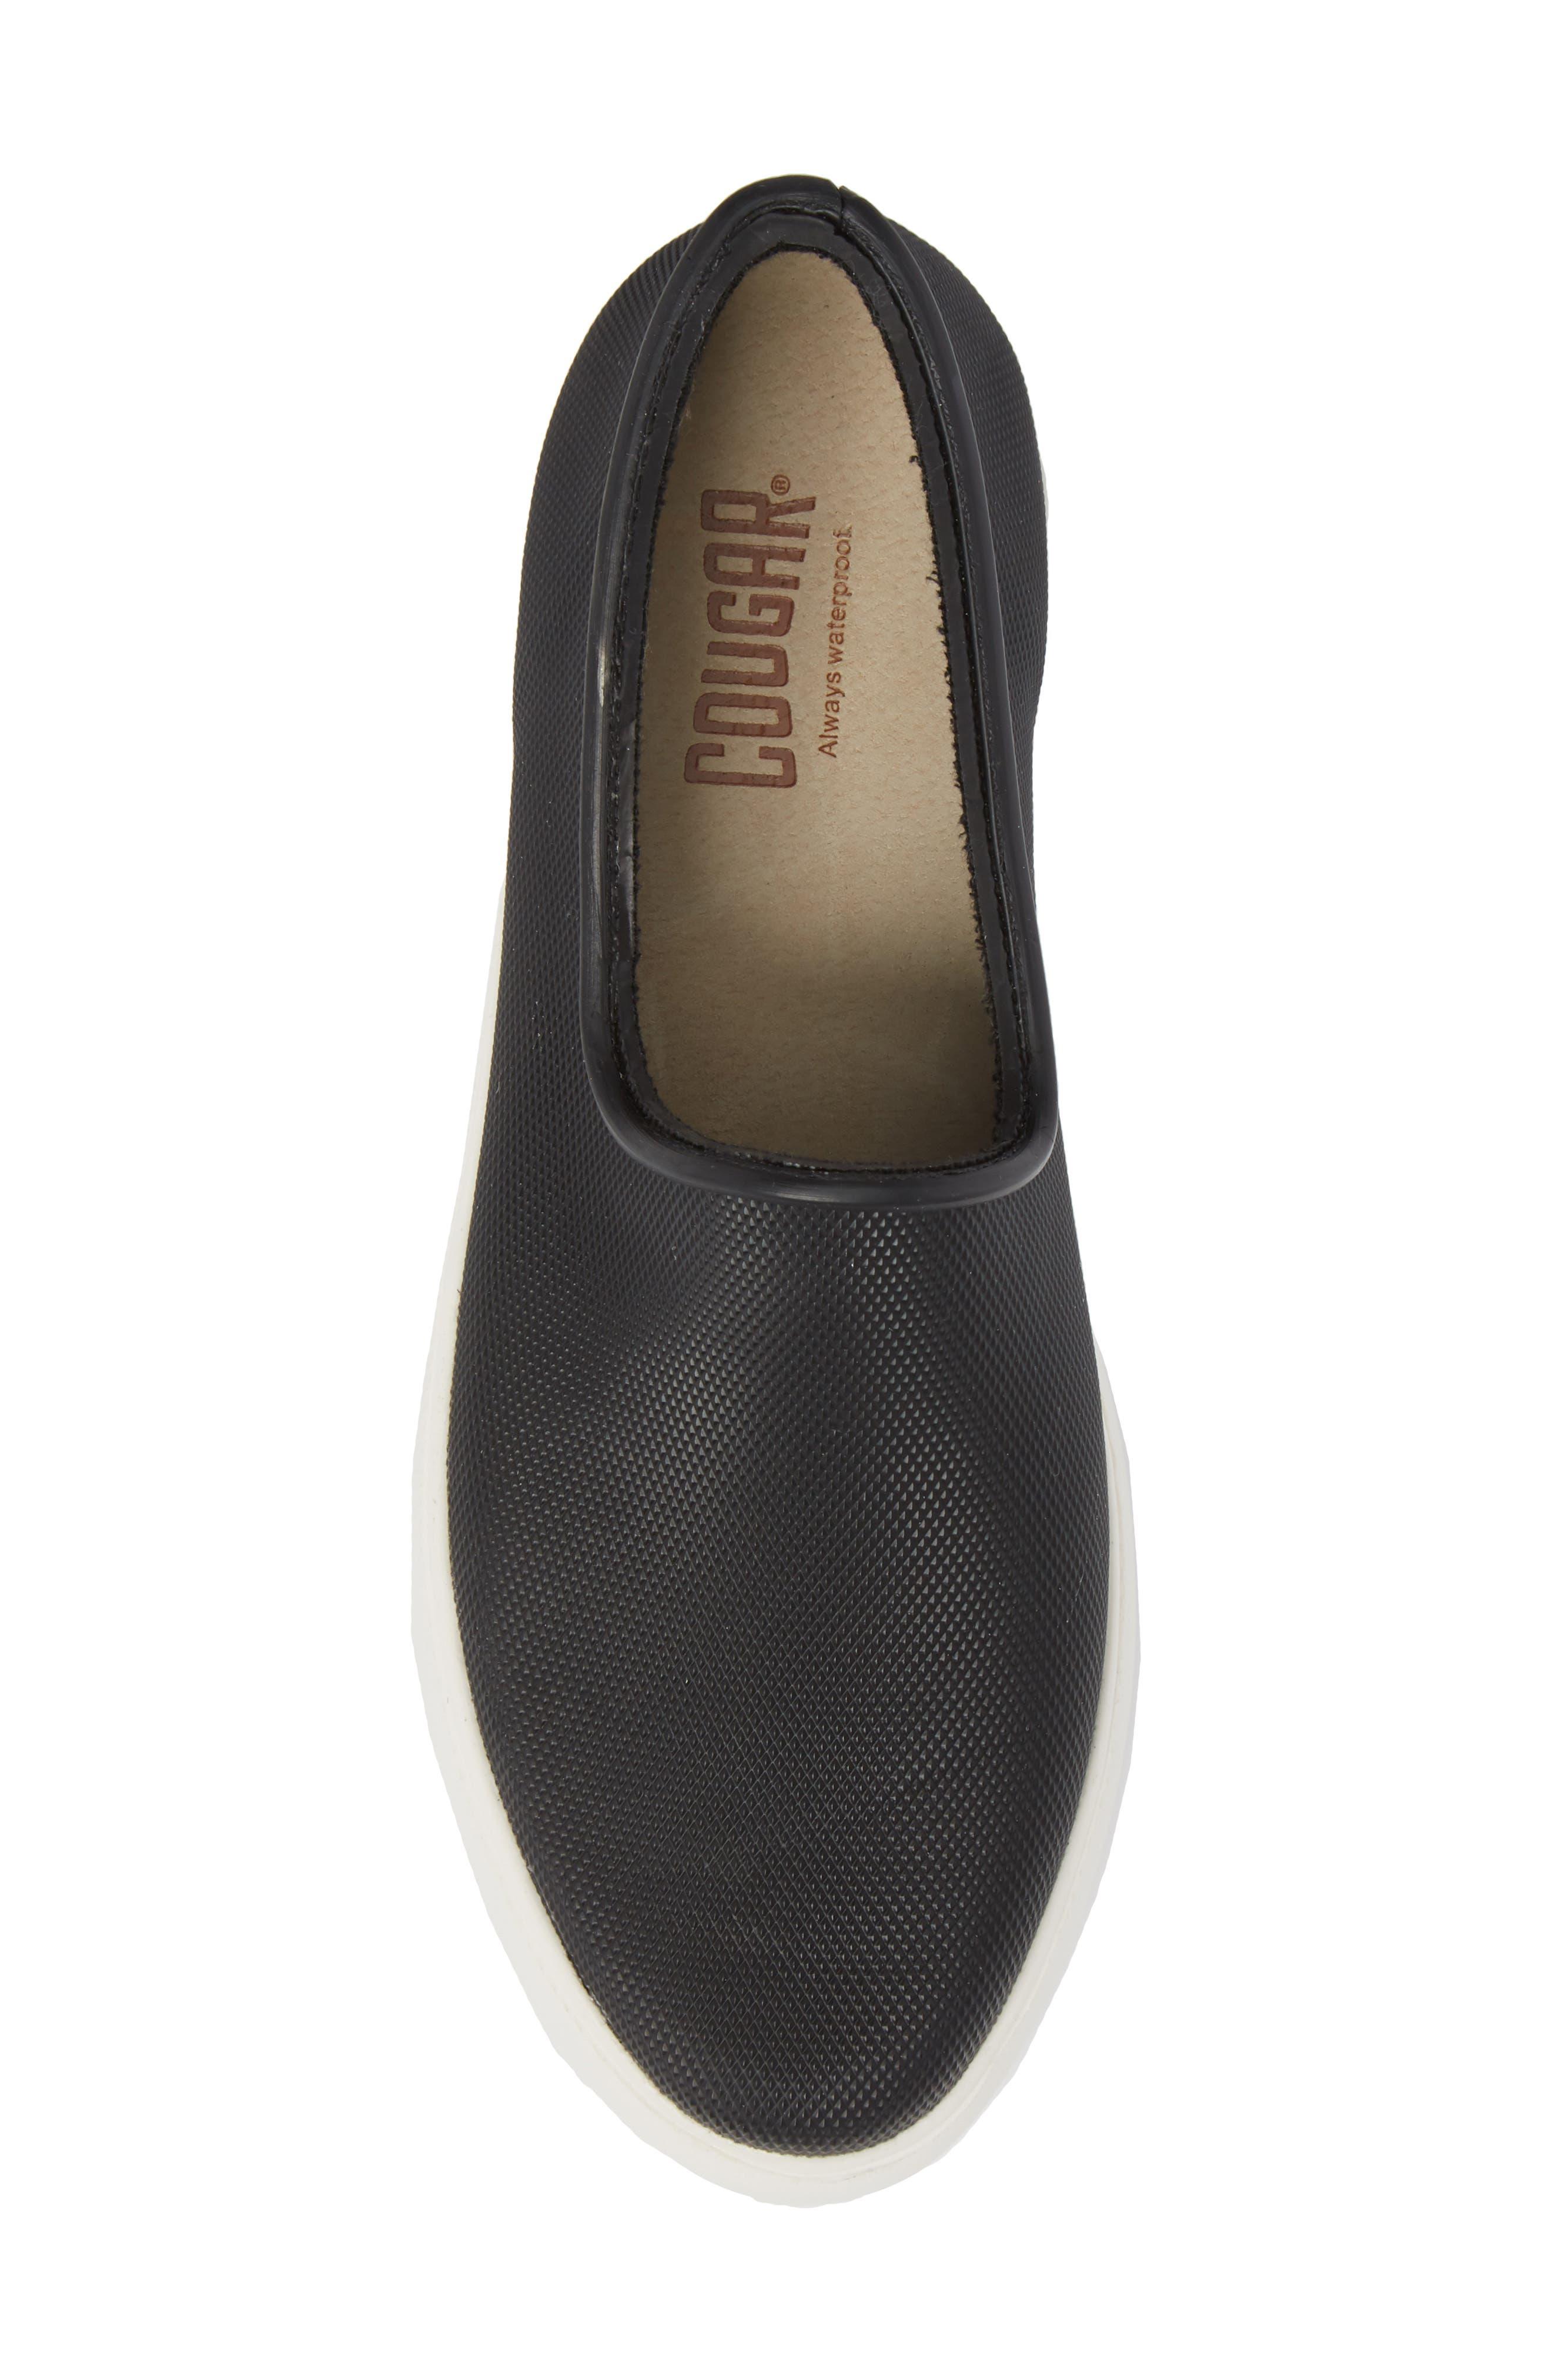 Rainy Day Waterproof Slip-On Sneaker,                             Alternate thumbnail 5, color,                             001